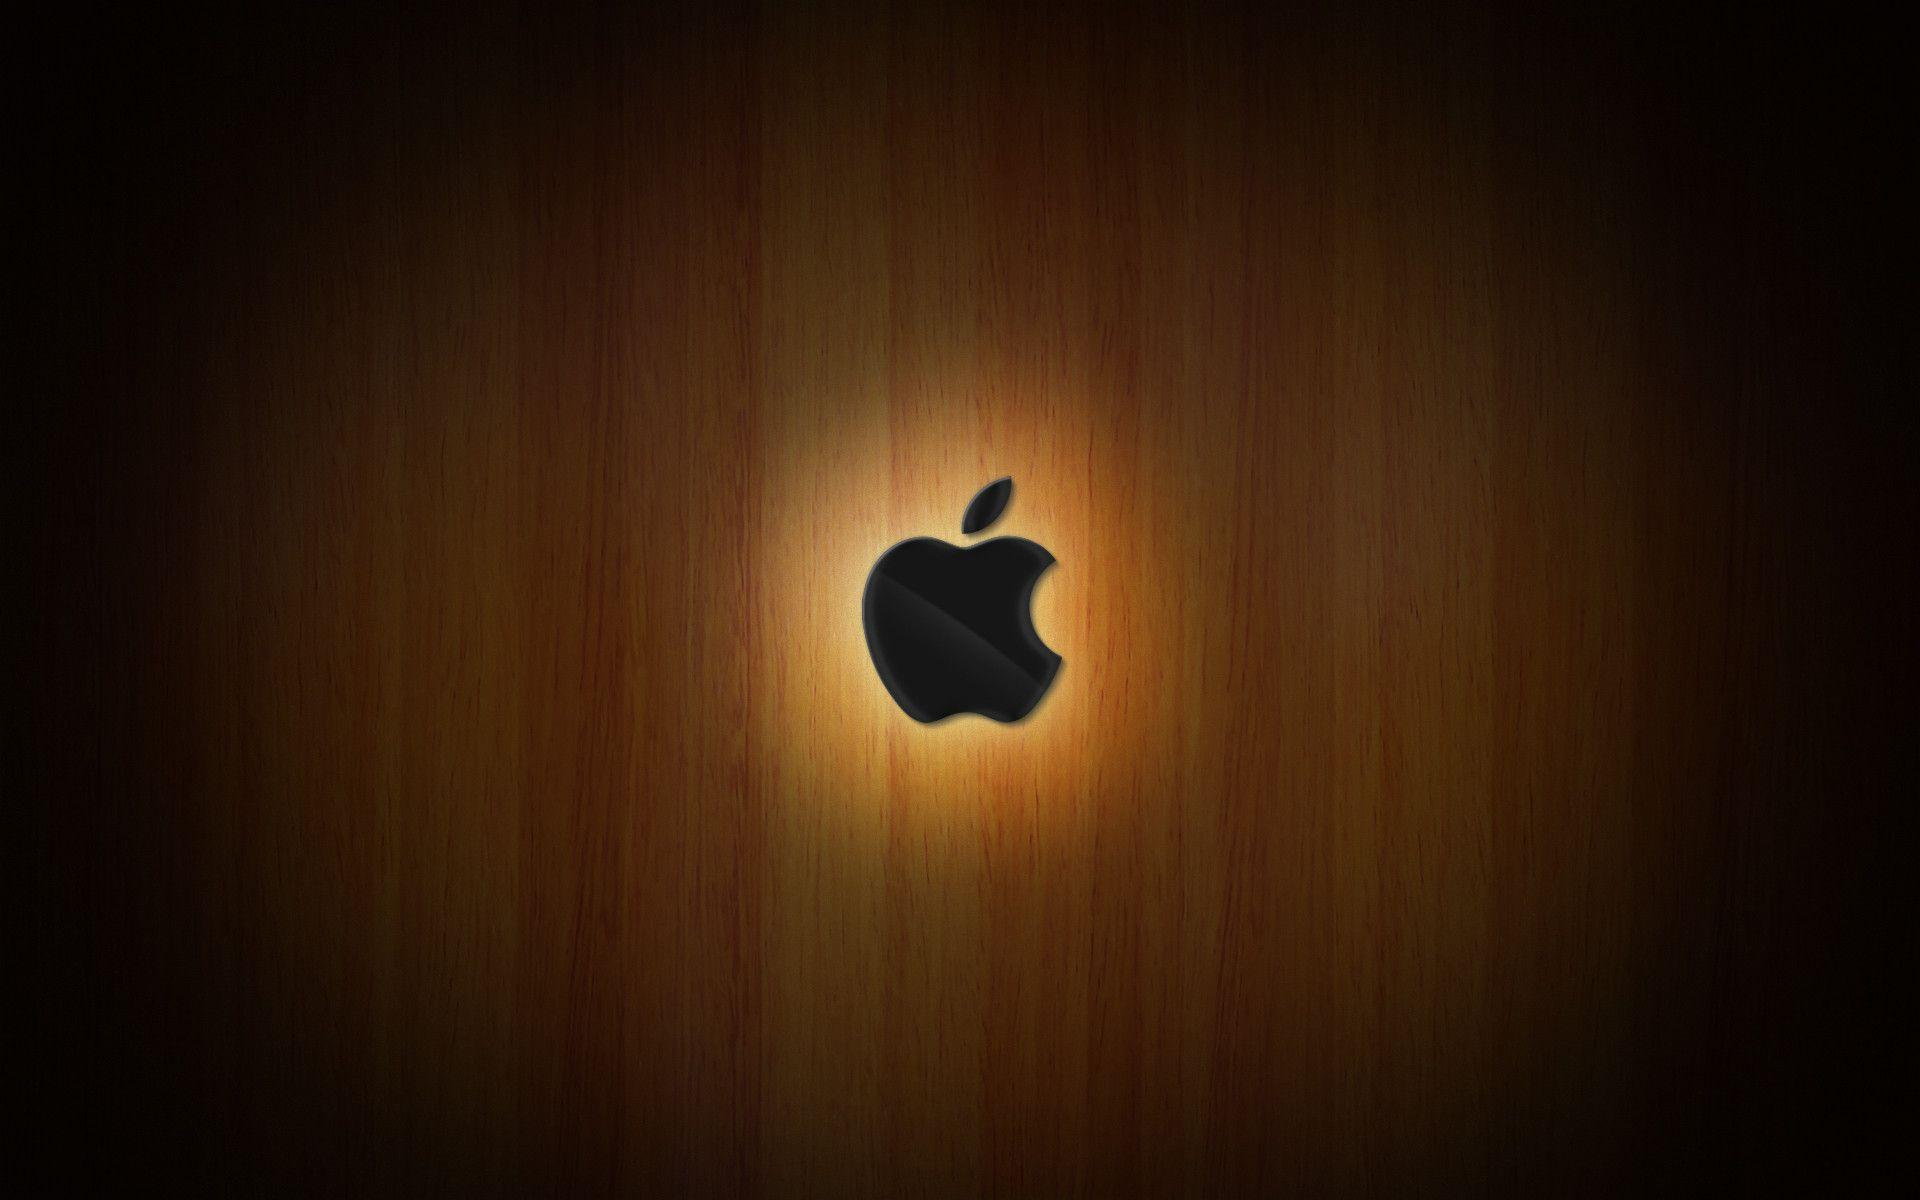 Apple Wallpapers Hd 1080p Wallpaper Cave